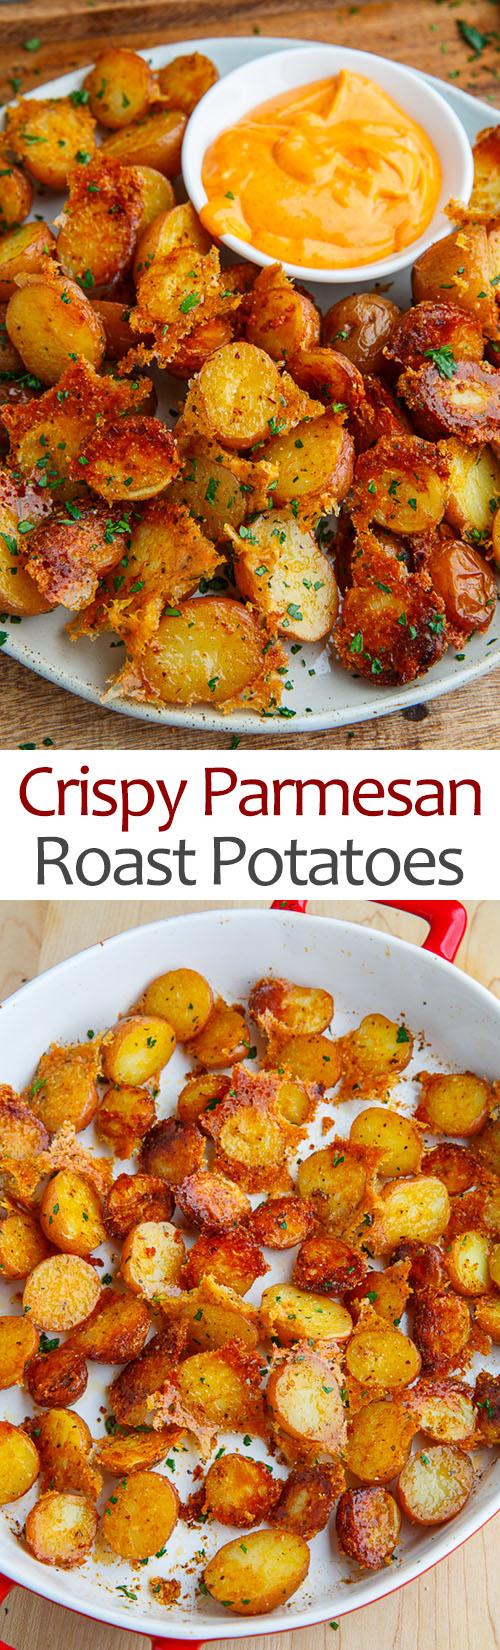 Crispy Parmesan Roast Potatoes